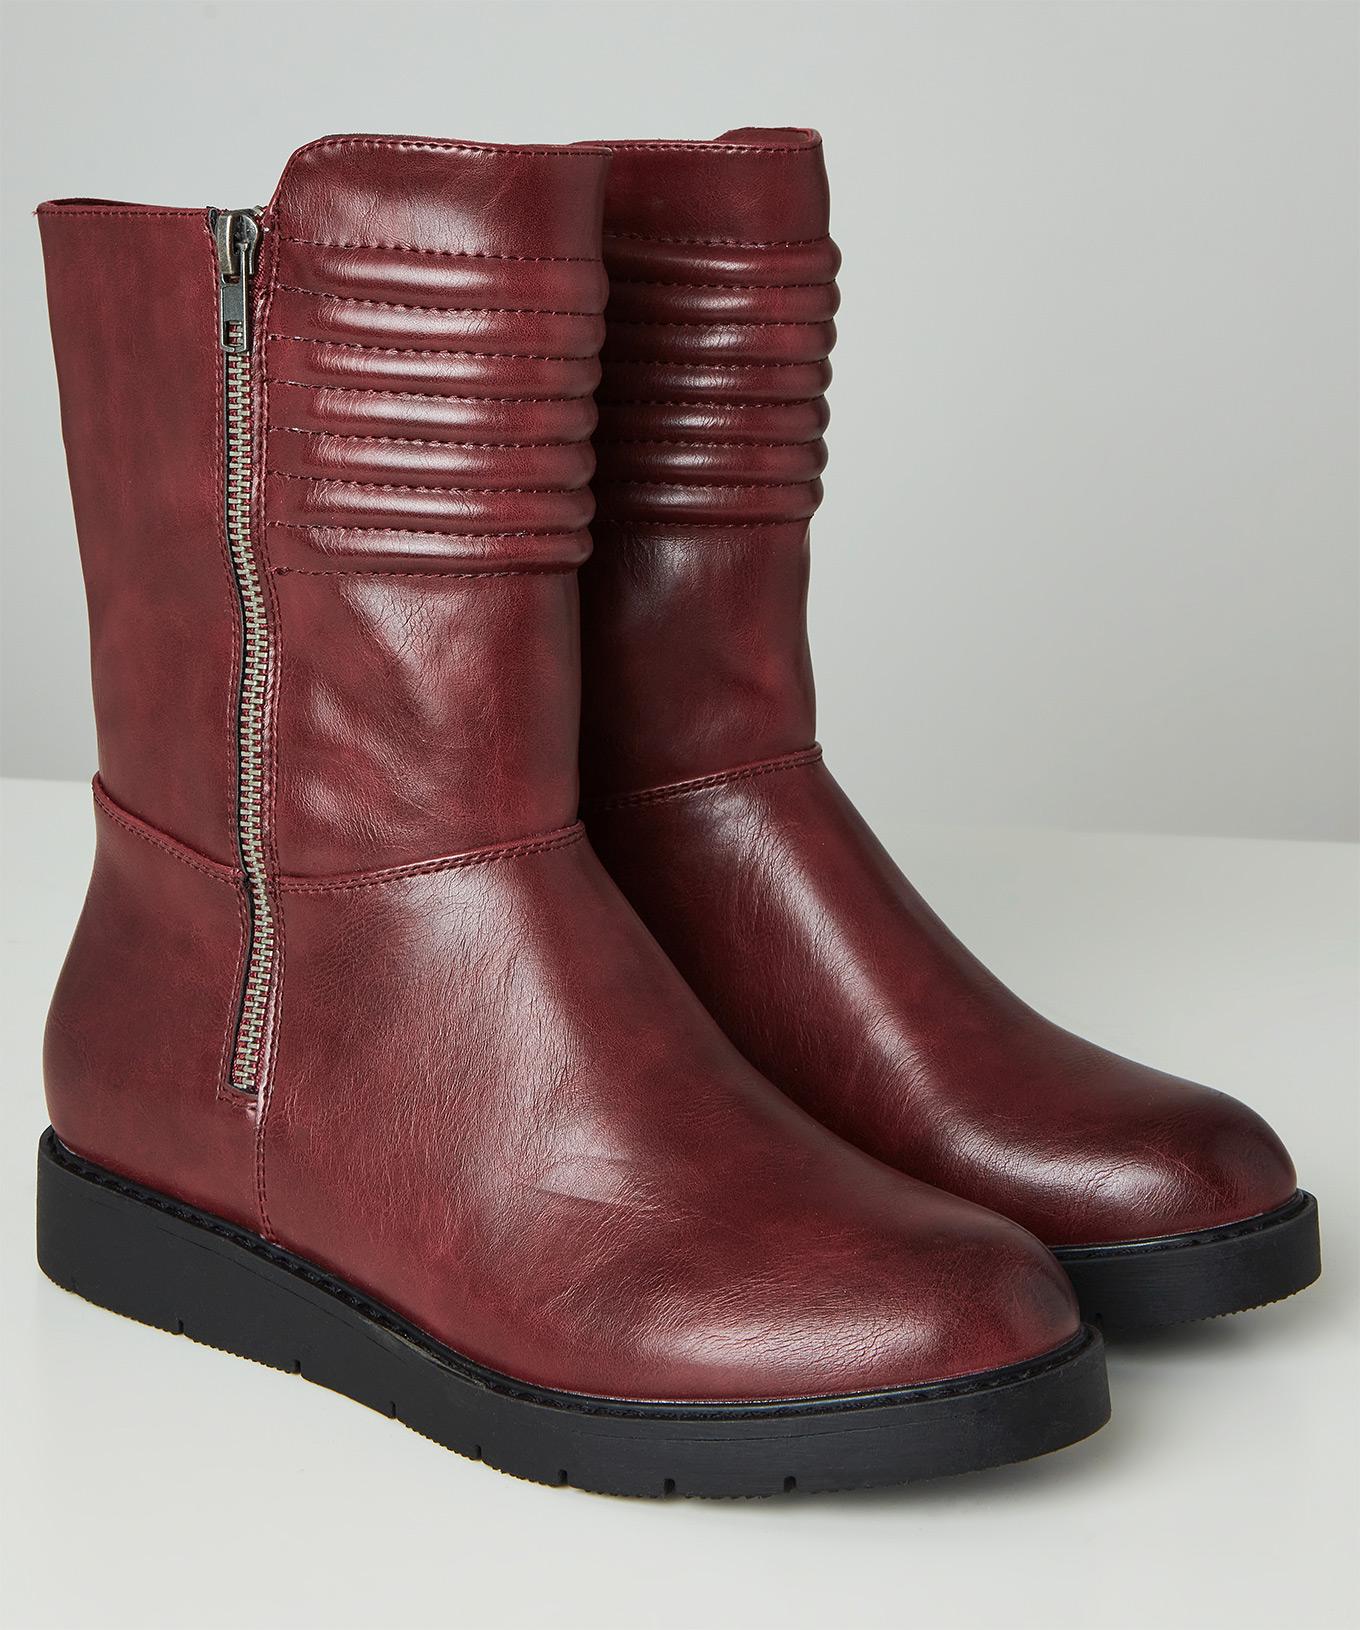 joe browns stylish signature boots